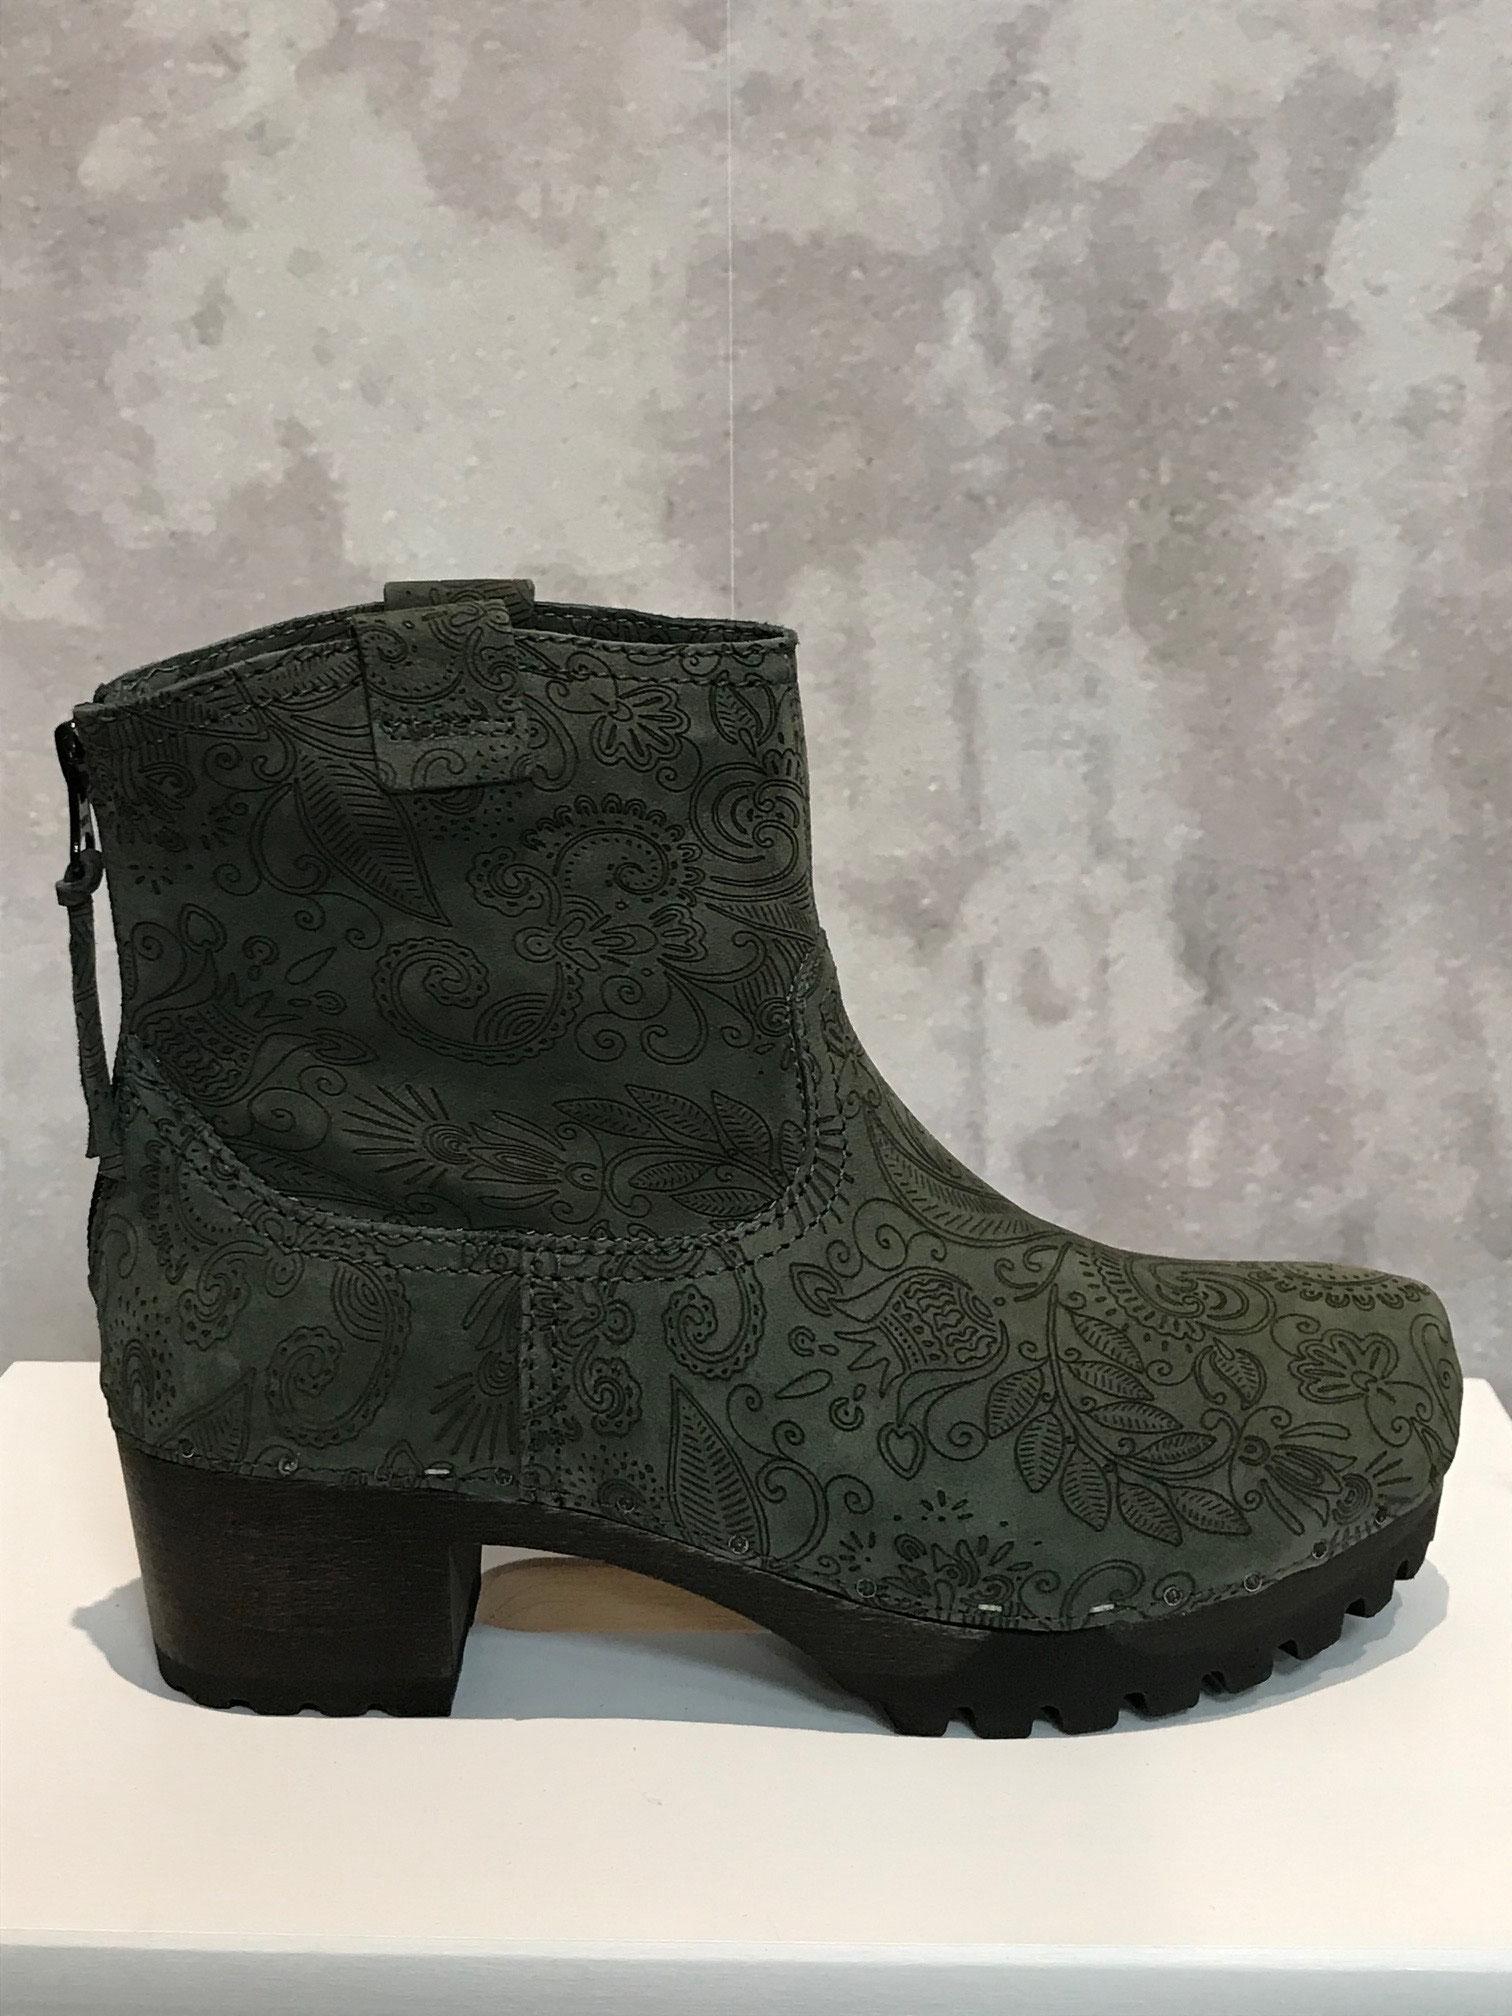 INKEN Boho Nubuk grün,  Reißverschluss hinten, Größen 37 / 38 / 39 / 41, UVP 249,95, Sale 200,00 Euro